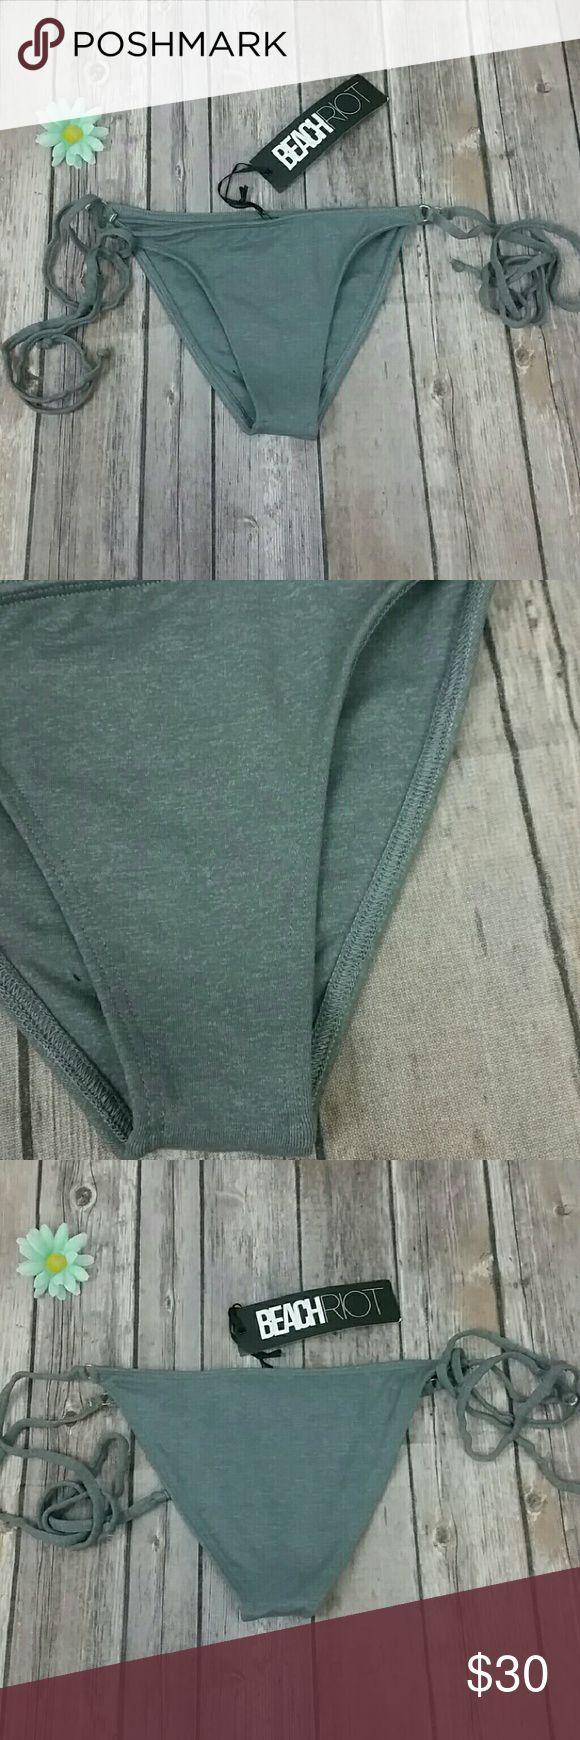 Beach riot bikini All grey ties sides bottoms brand new Beach Riot Swim Bikinis